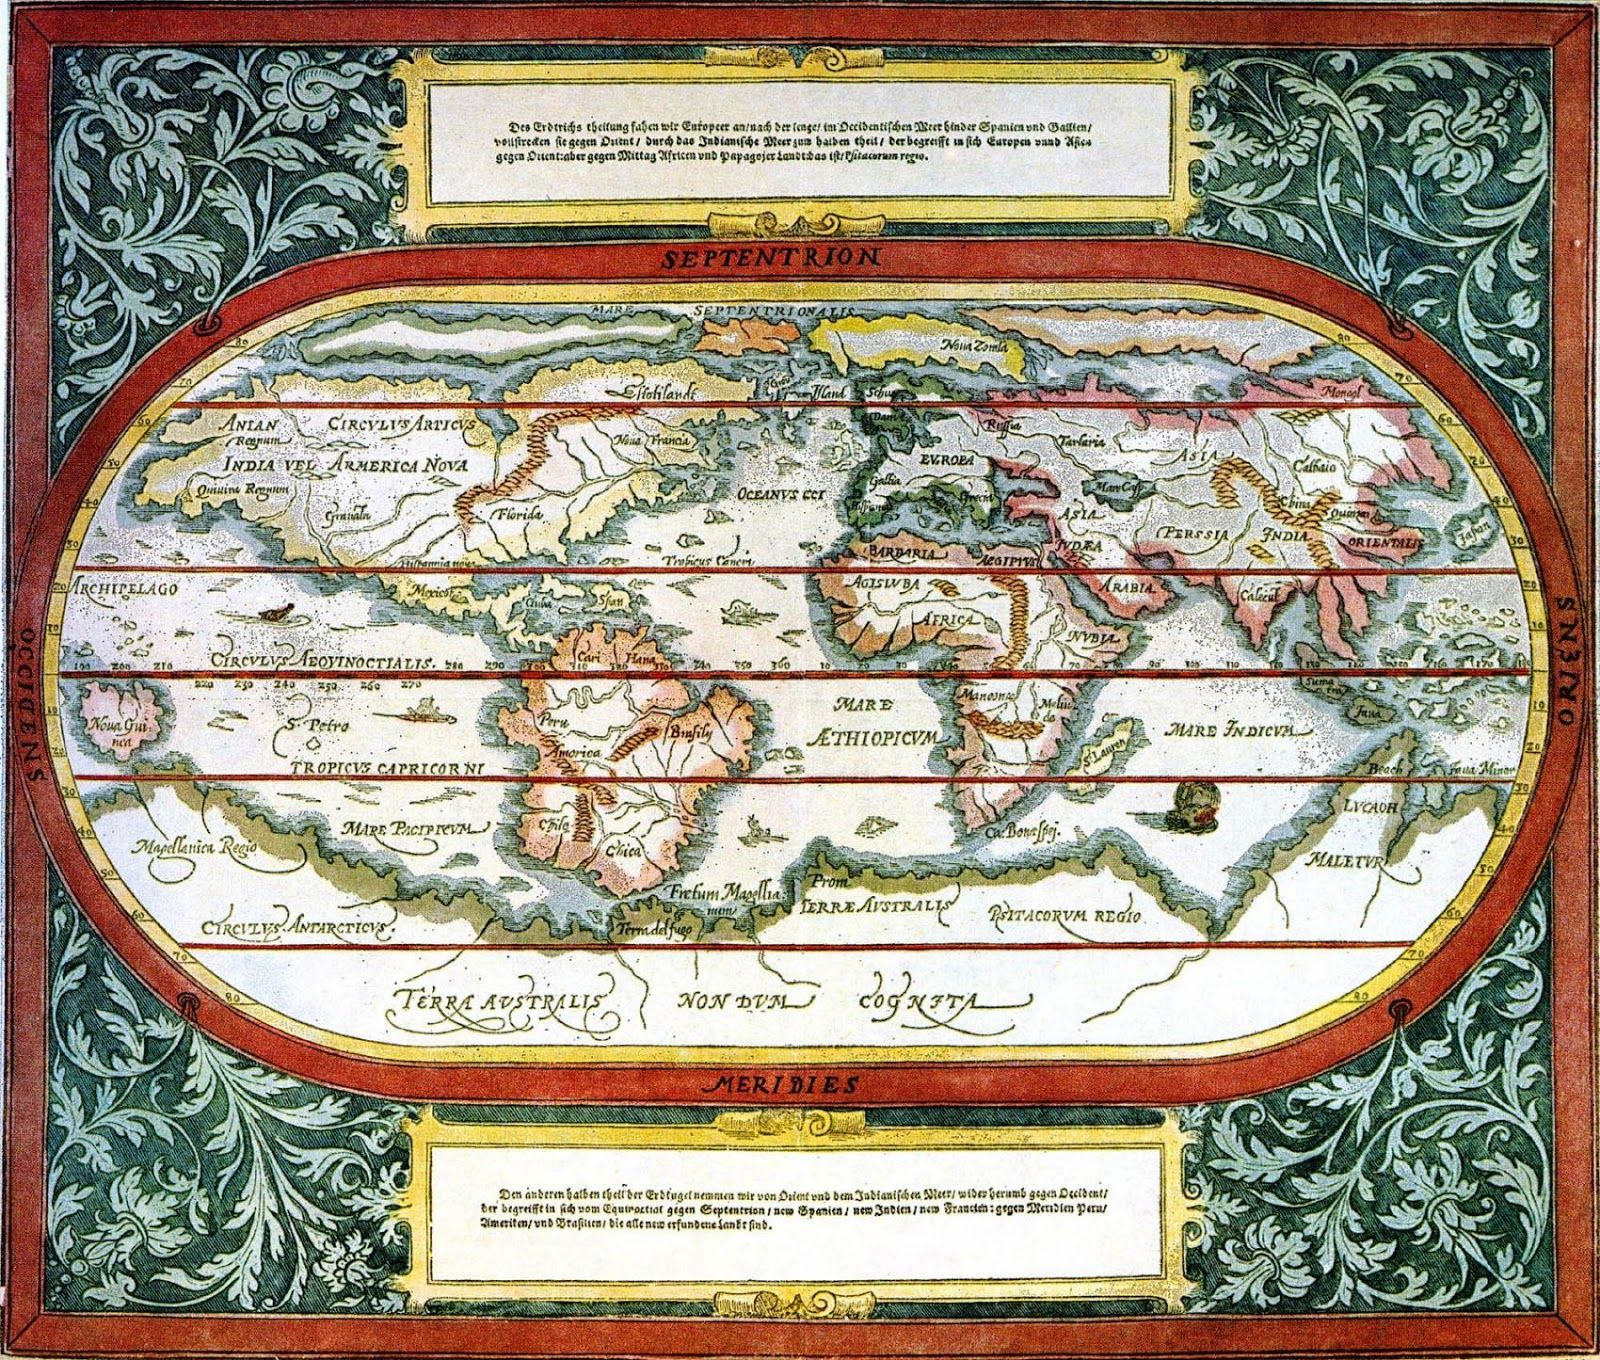 World map 16th century description world map published in 1544 by world map 16th century description world map published in 1544 by the german scientist and gumiabroncs Gallery